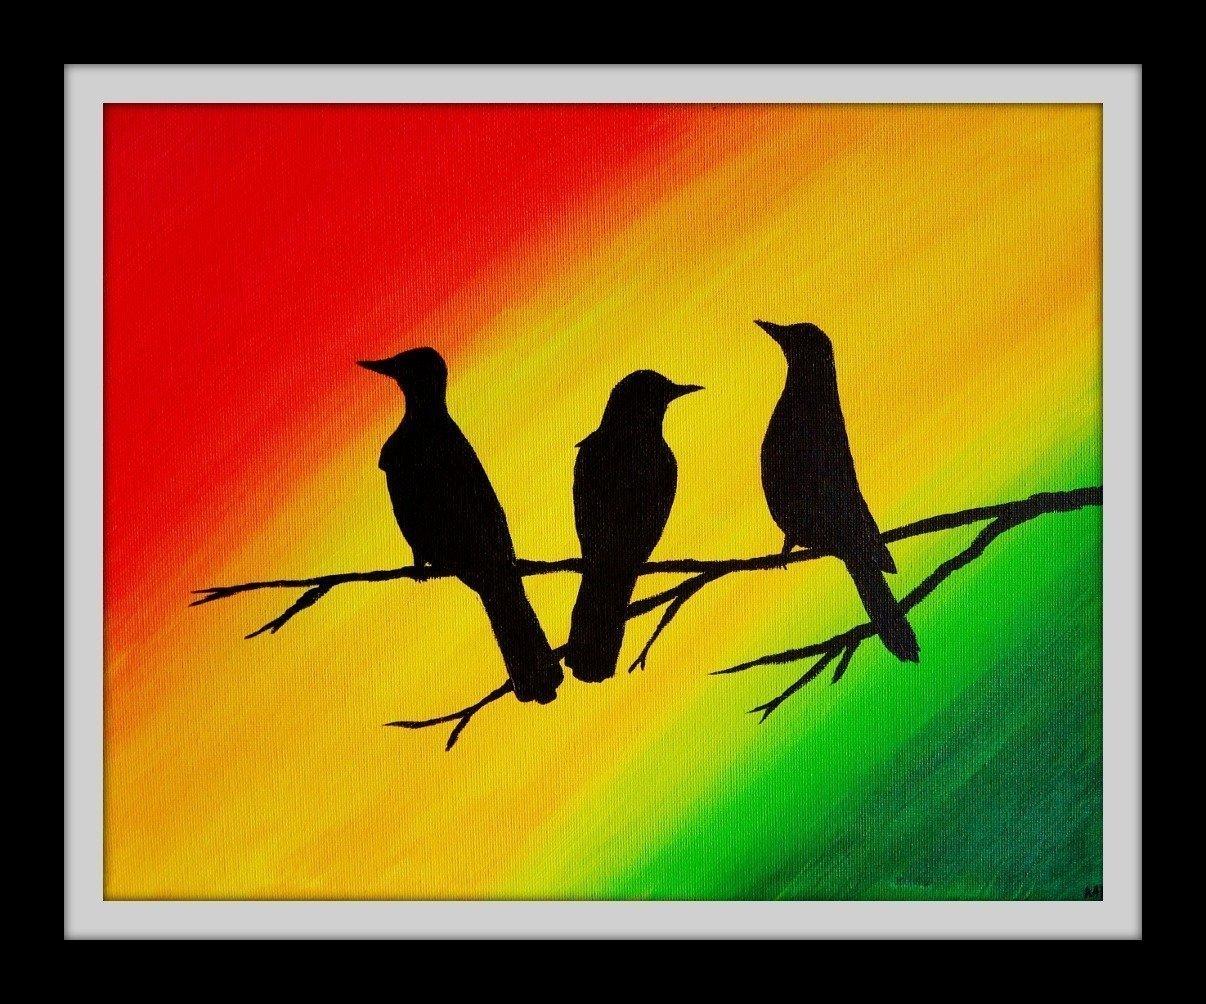 Amazon.com: Three Little Birds 9x12 Inch Wall Art Print Rasta Colors ...